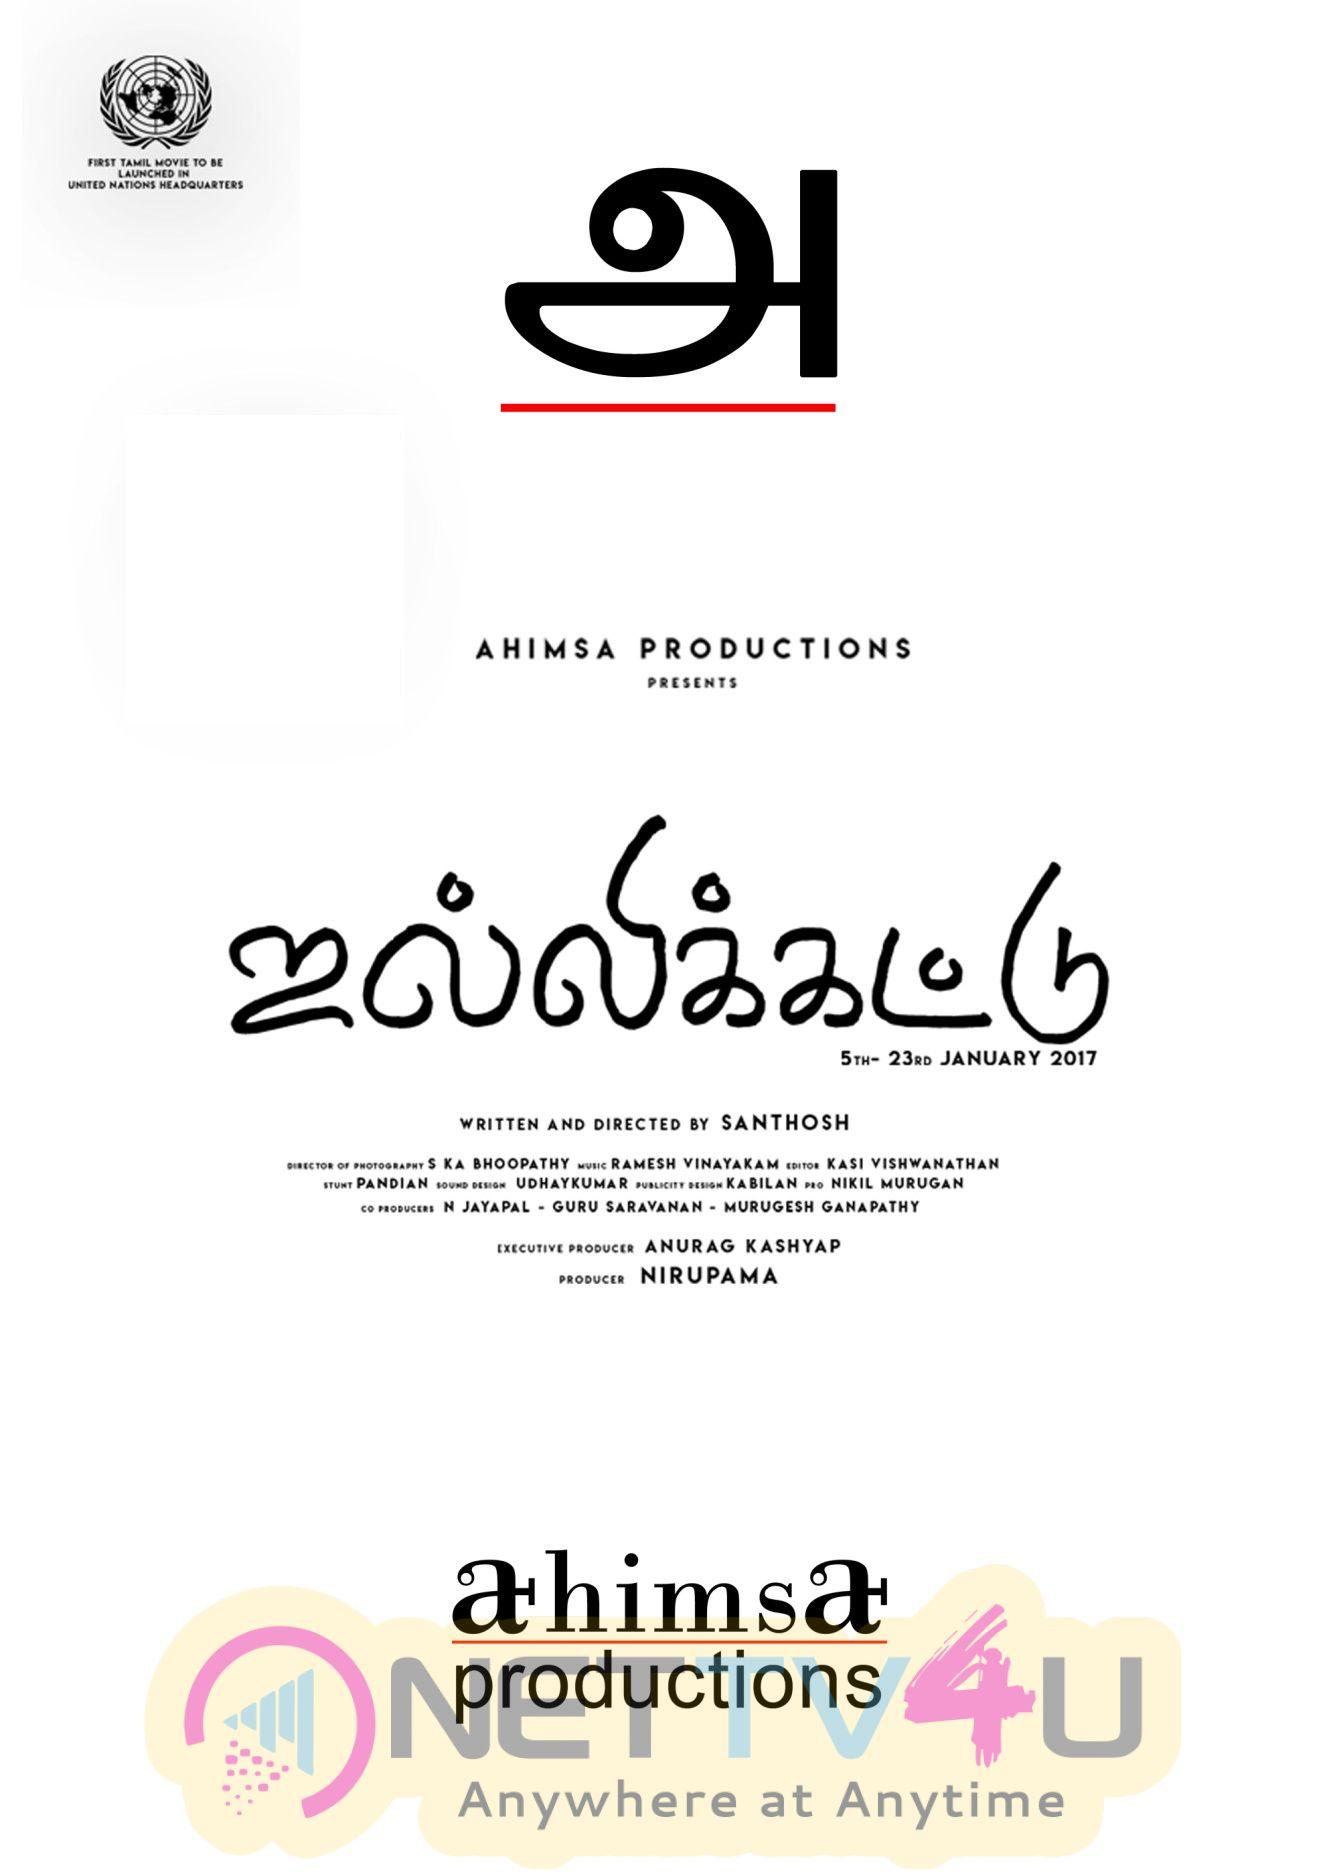 Jallikattu Tamil Movie And  The Harvard Tamil Chair Signed An Agreement Event Pics